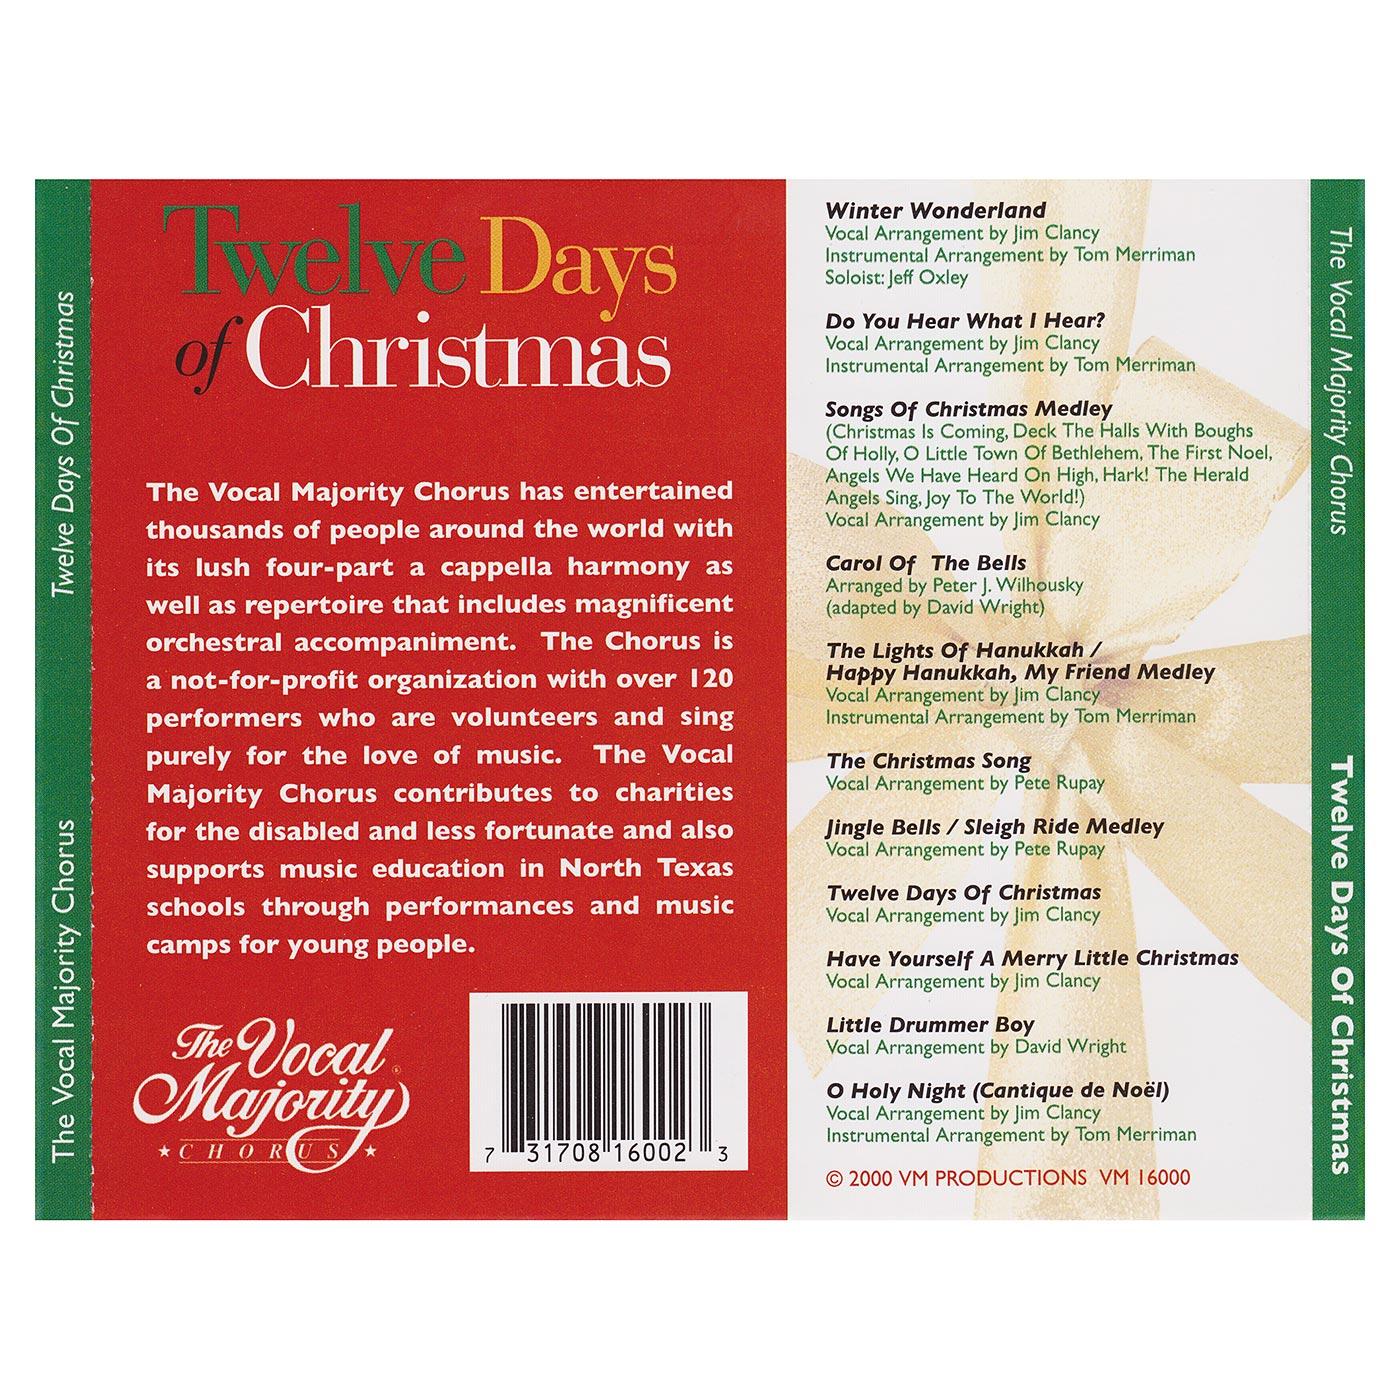 Tray Card: Twelve Days of Christmas